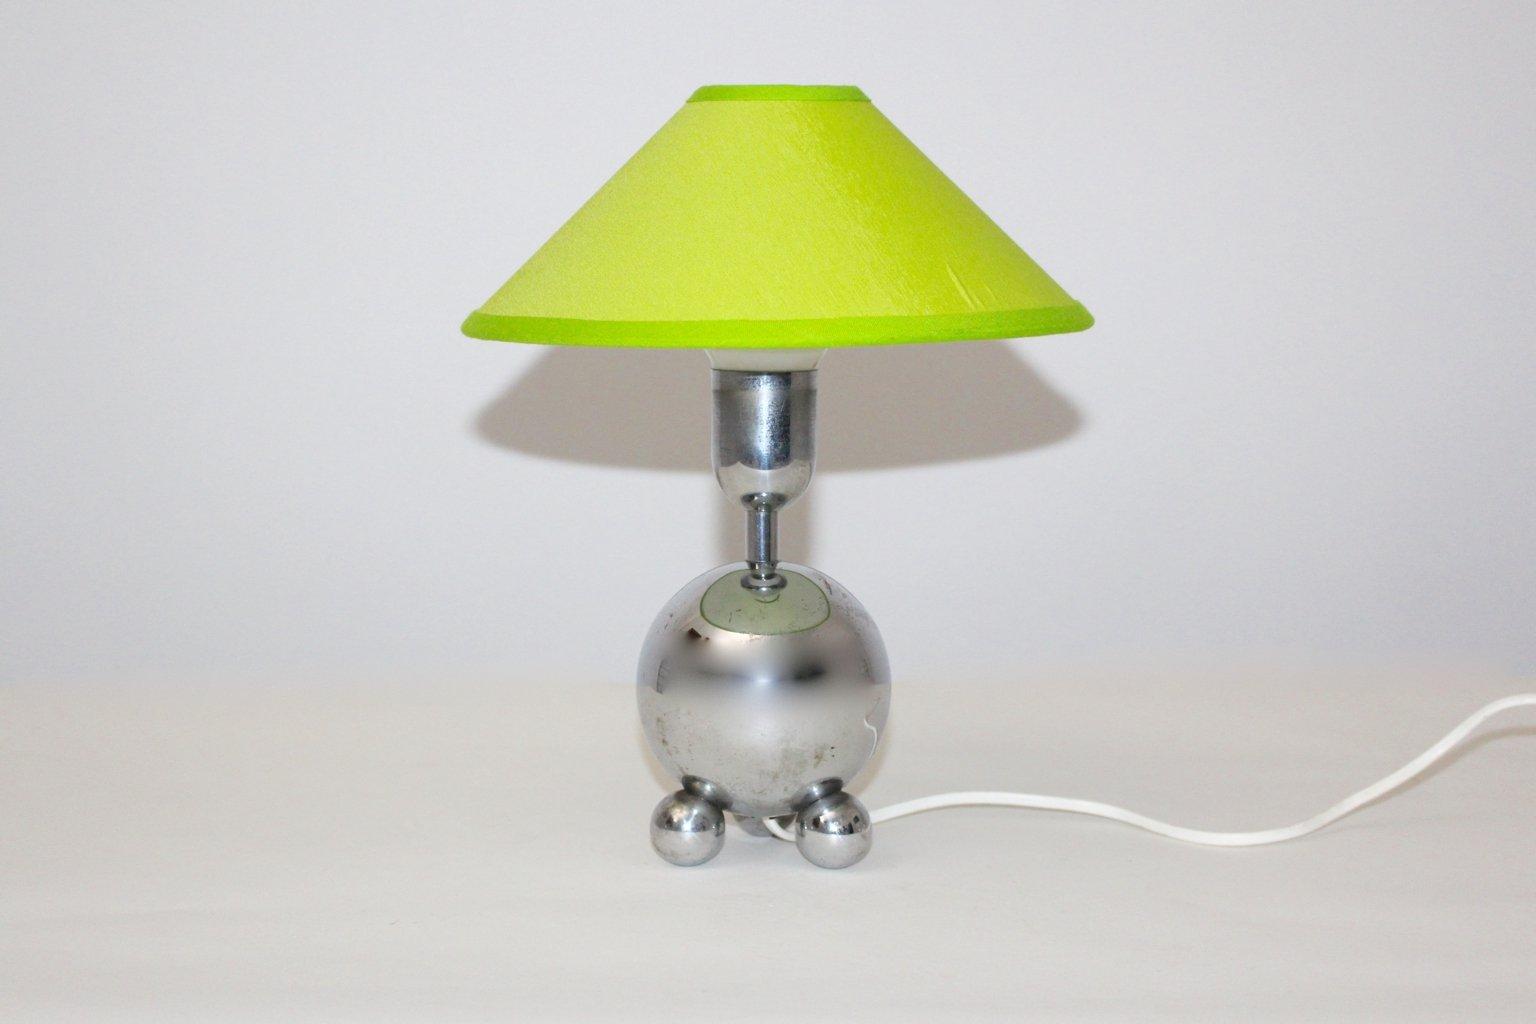 Lampe de bureau chrom e 1950s en vente sur pamono - Lampe de bureau style anglais ...